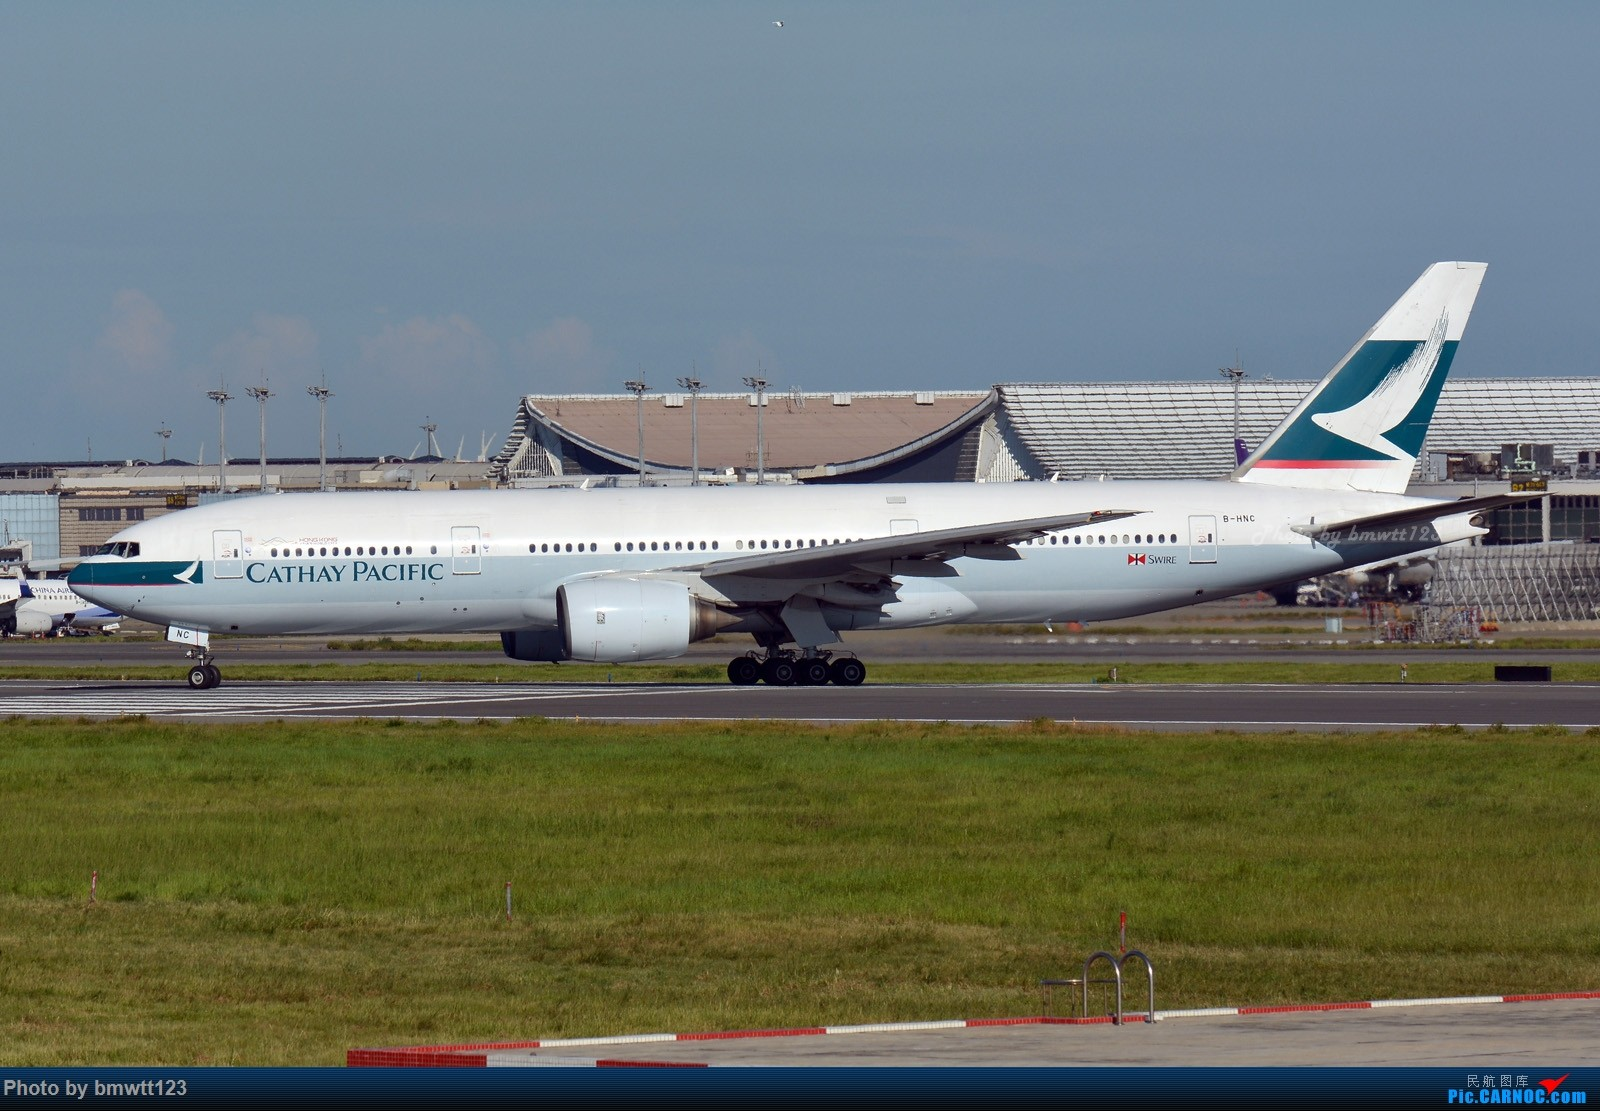 Re:[原创]【TPE桃园】台北2日游之桃园印象(一期42图),附桃园23L拍机位地图 BOEING 777-200 B-HNC 中国台北桃园国际机场